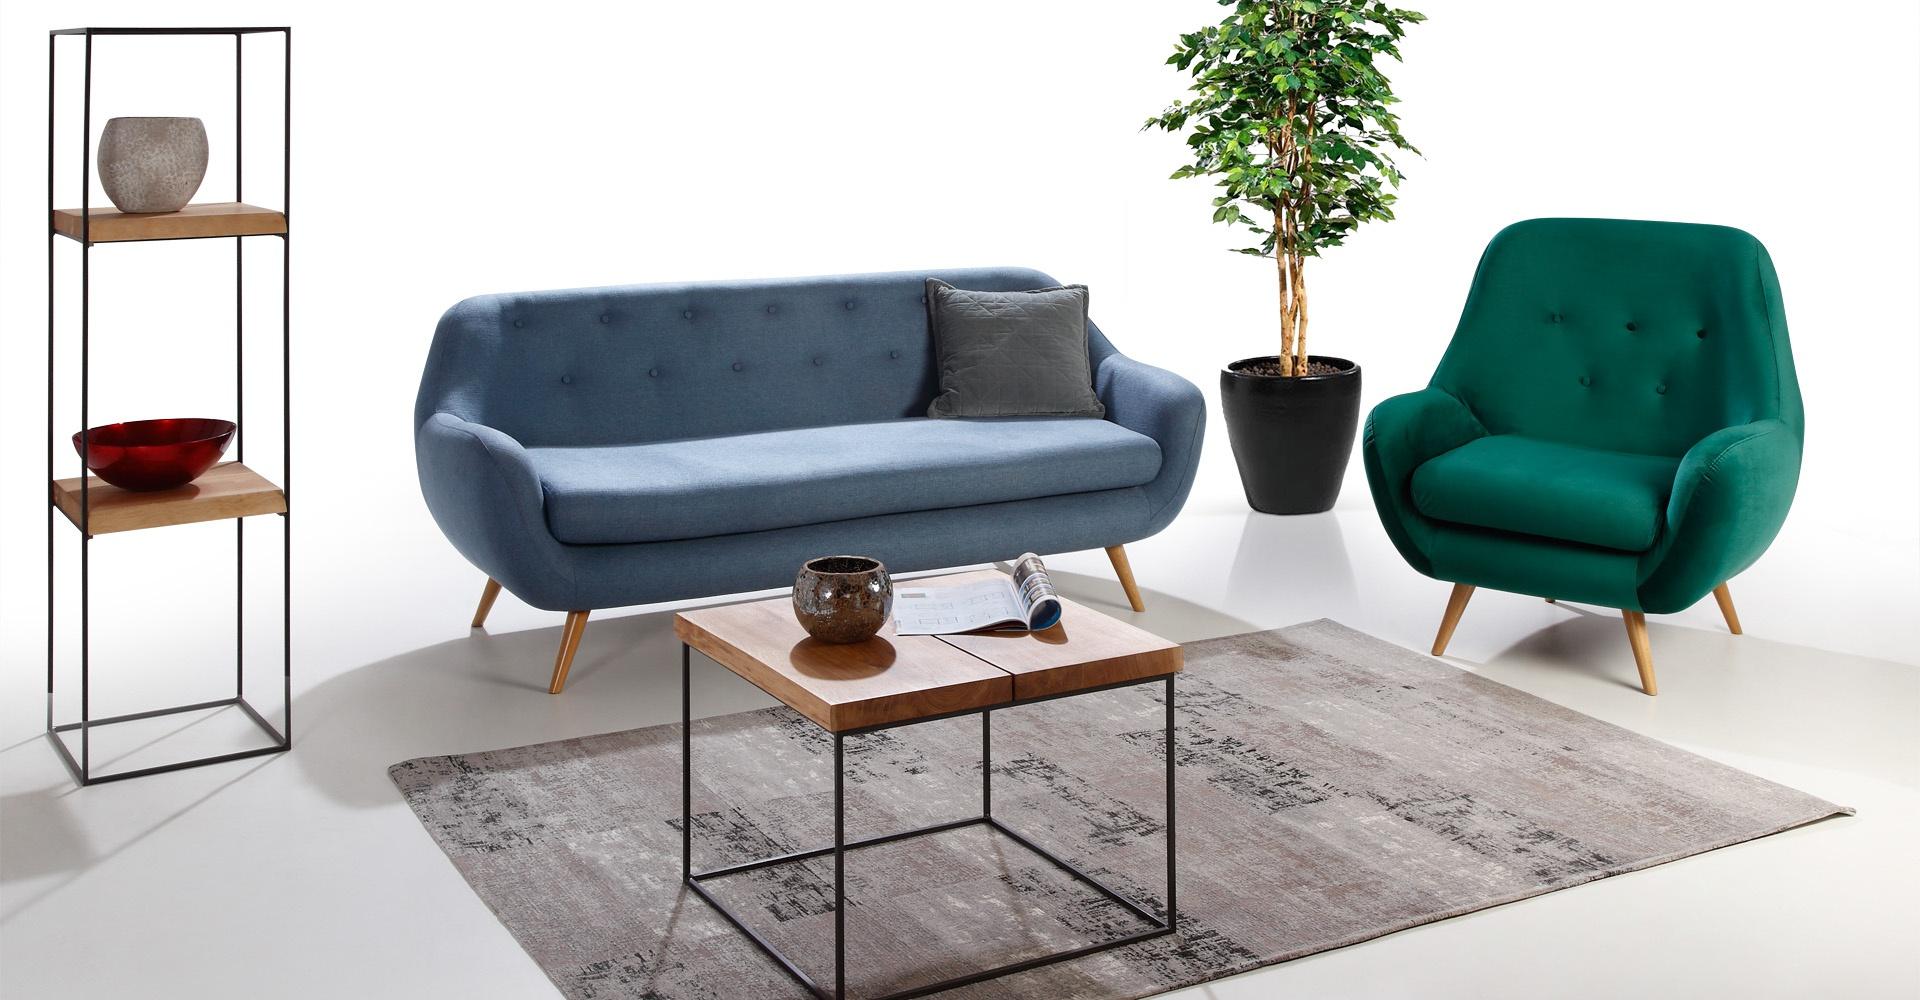 STILO sofy i fotele w modnym skandynawskim stylu.